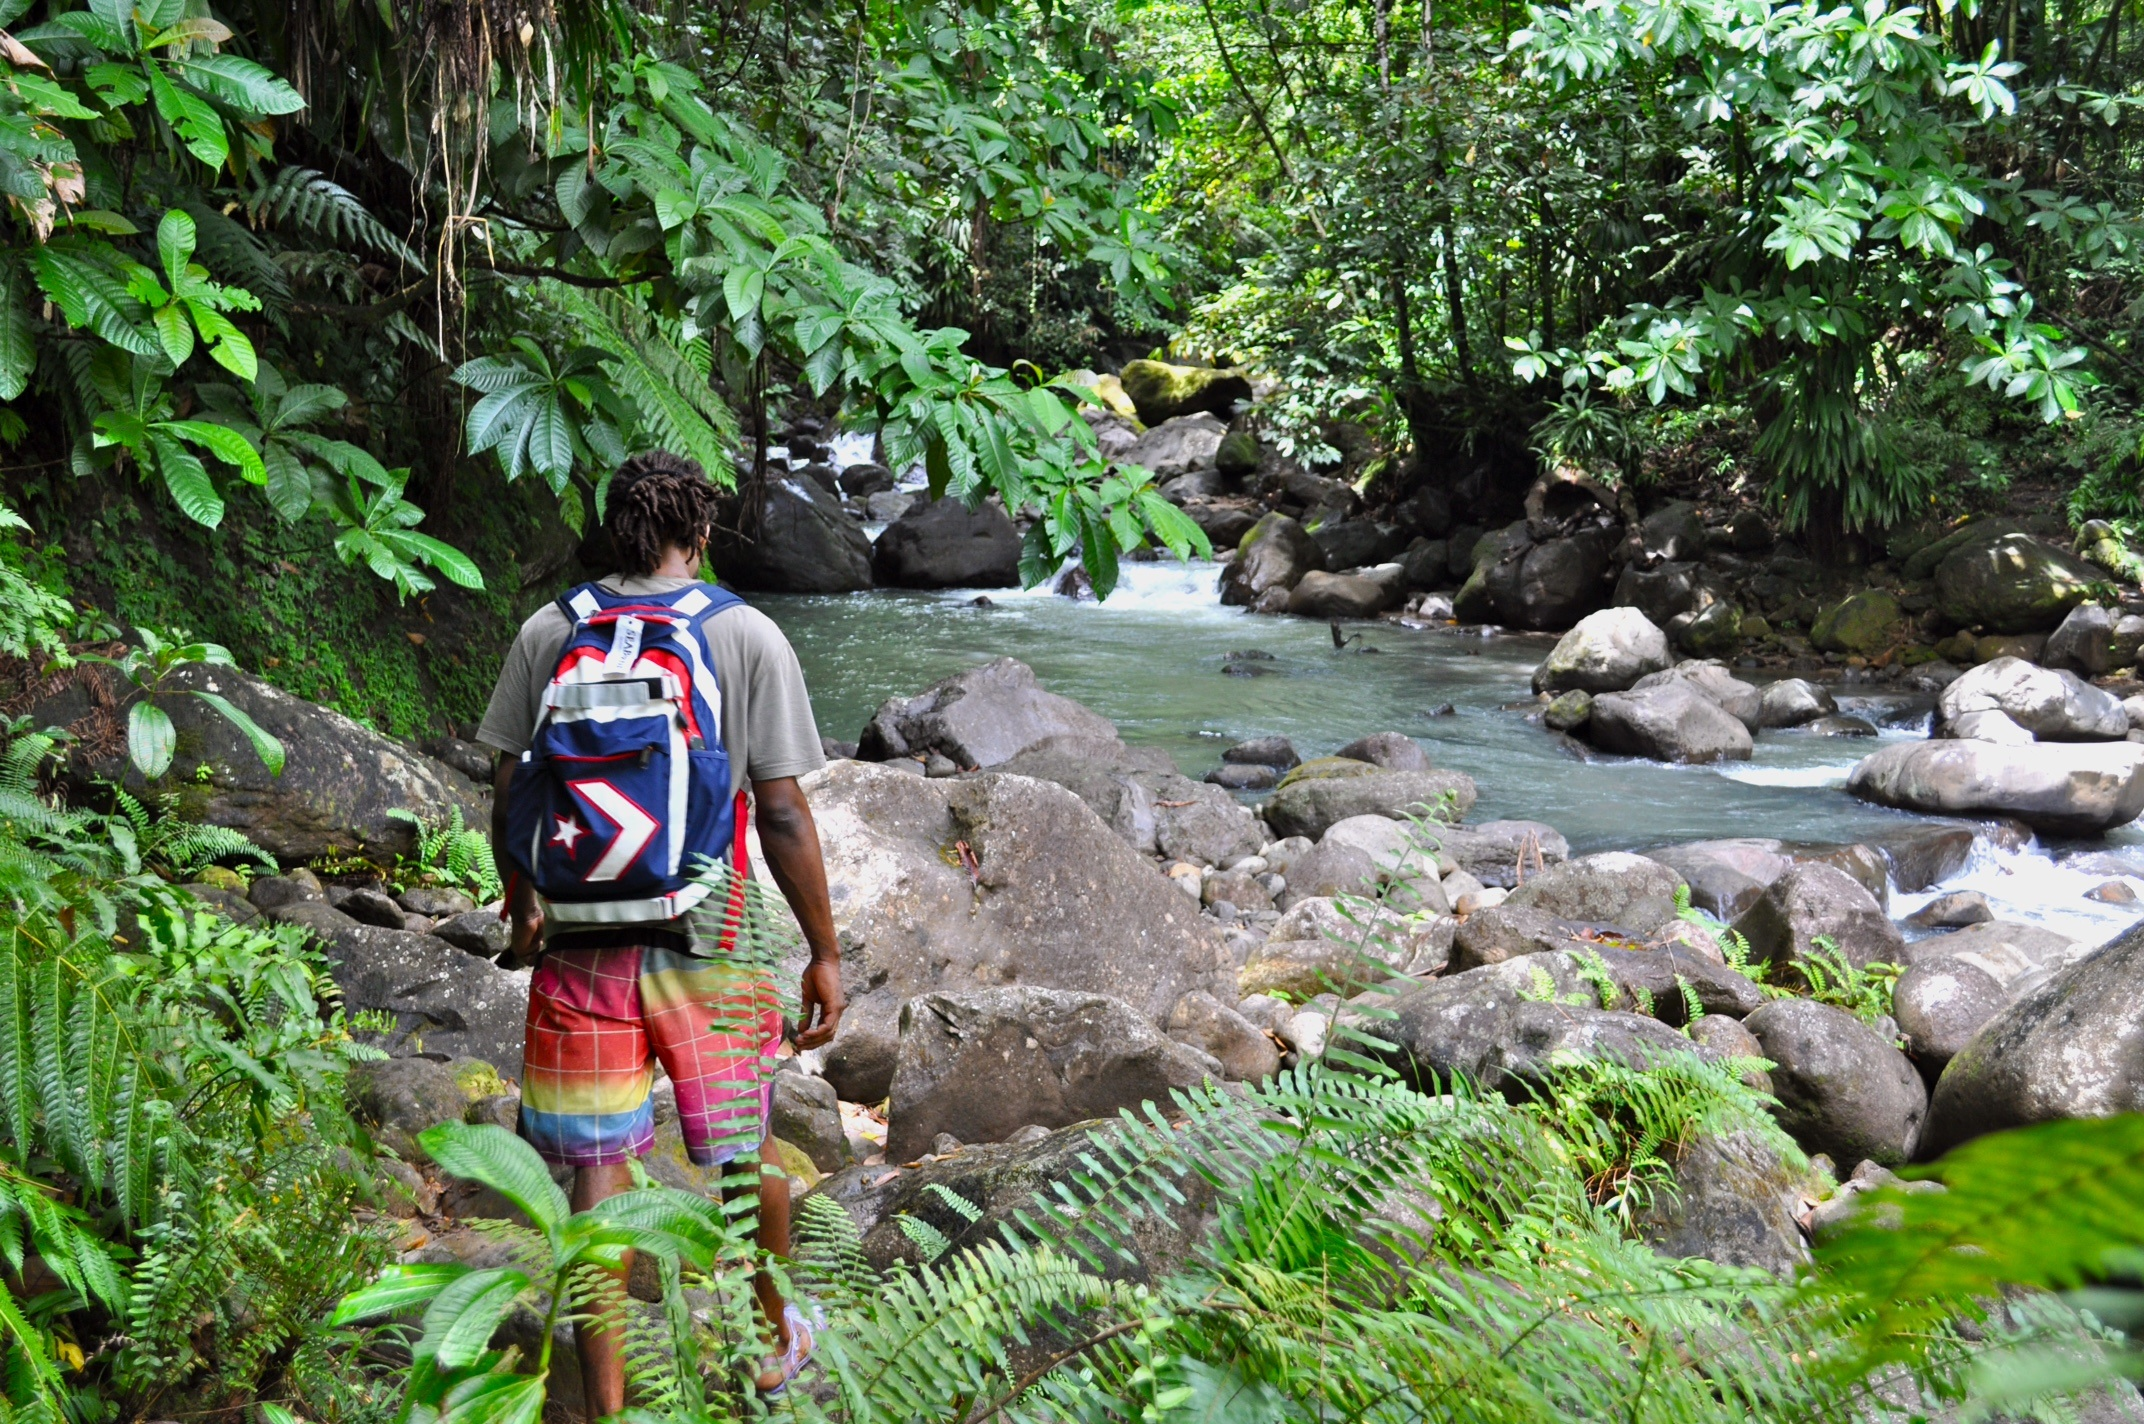 2015-02-09_54d8f159a6163_Dominica.jpg